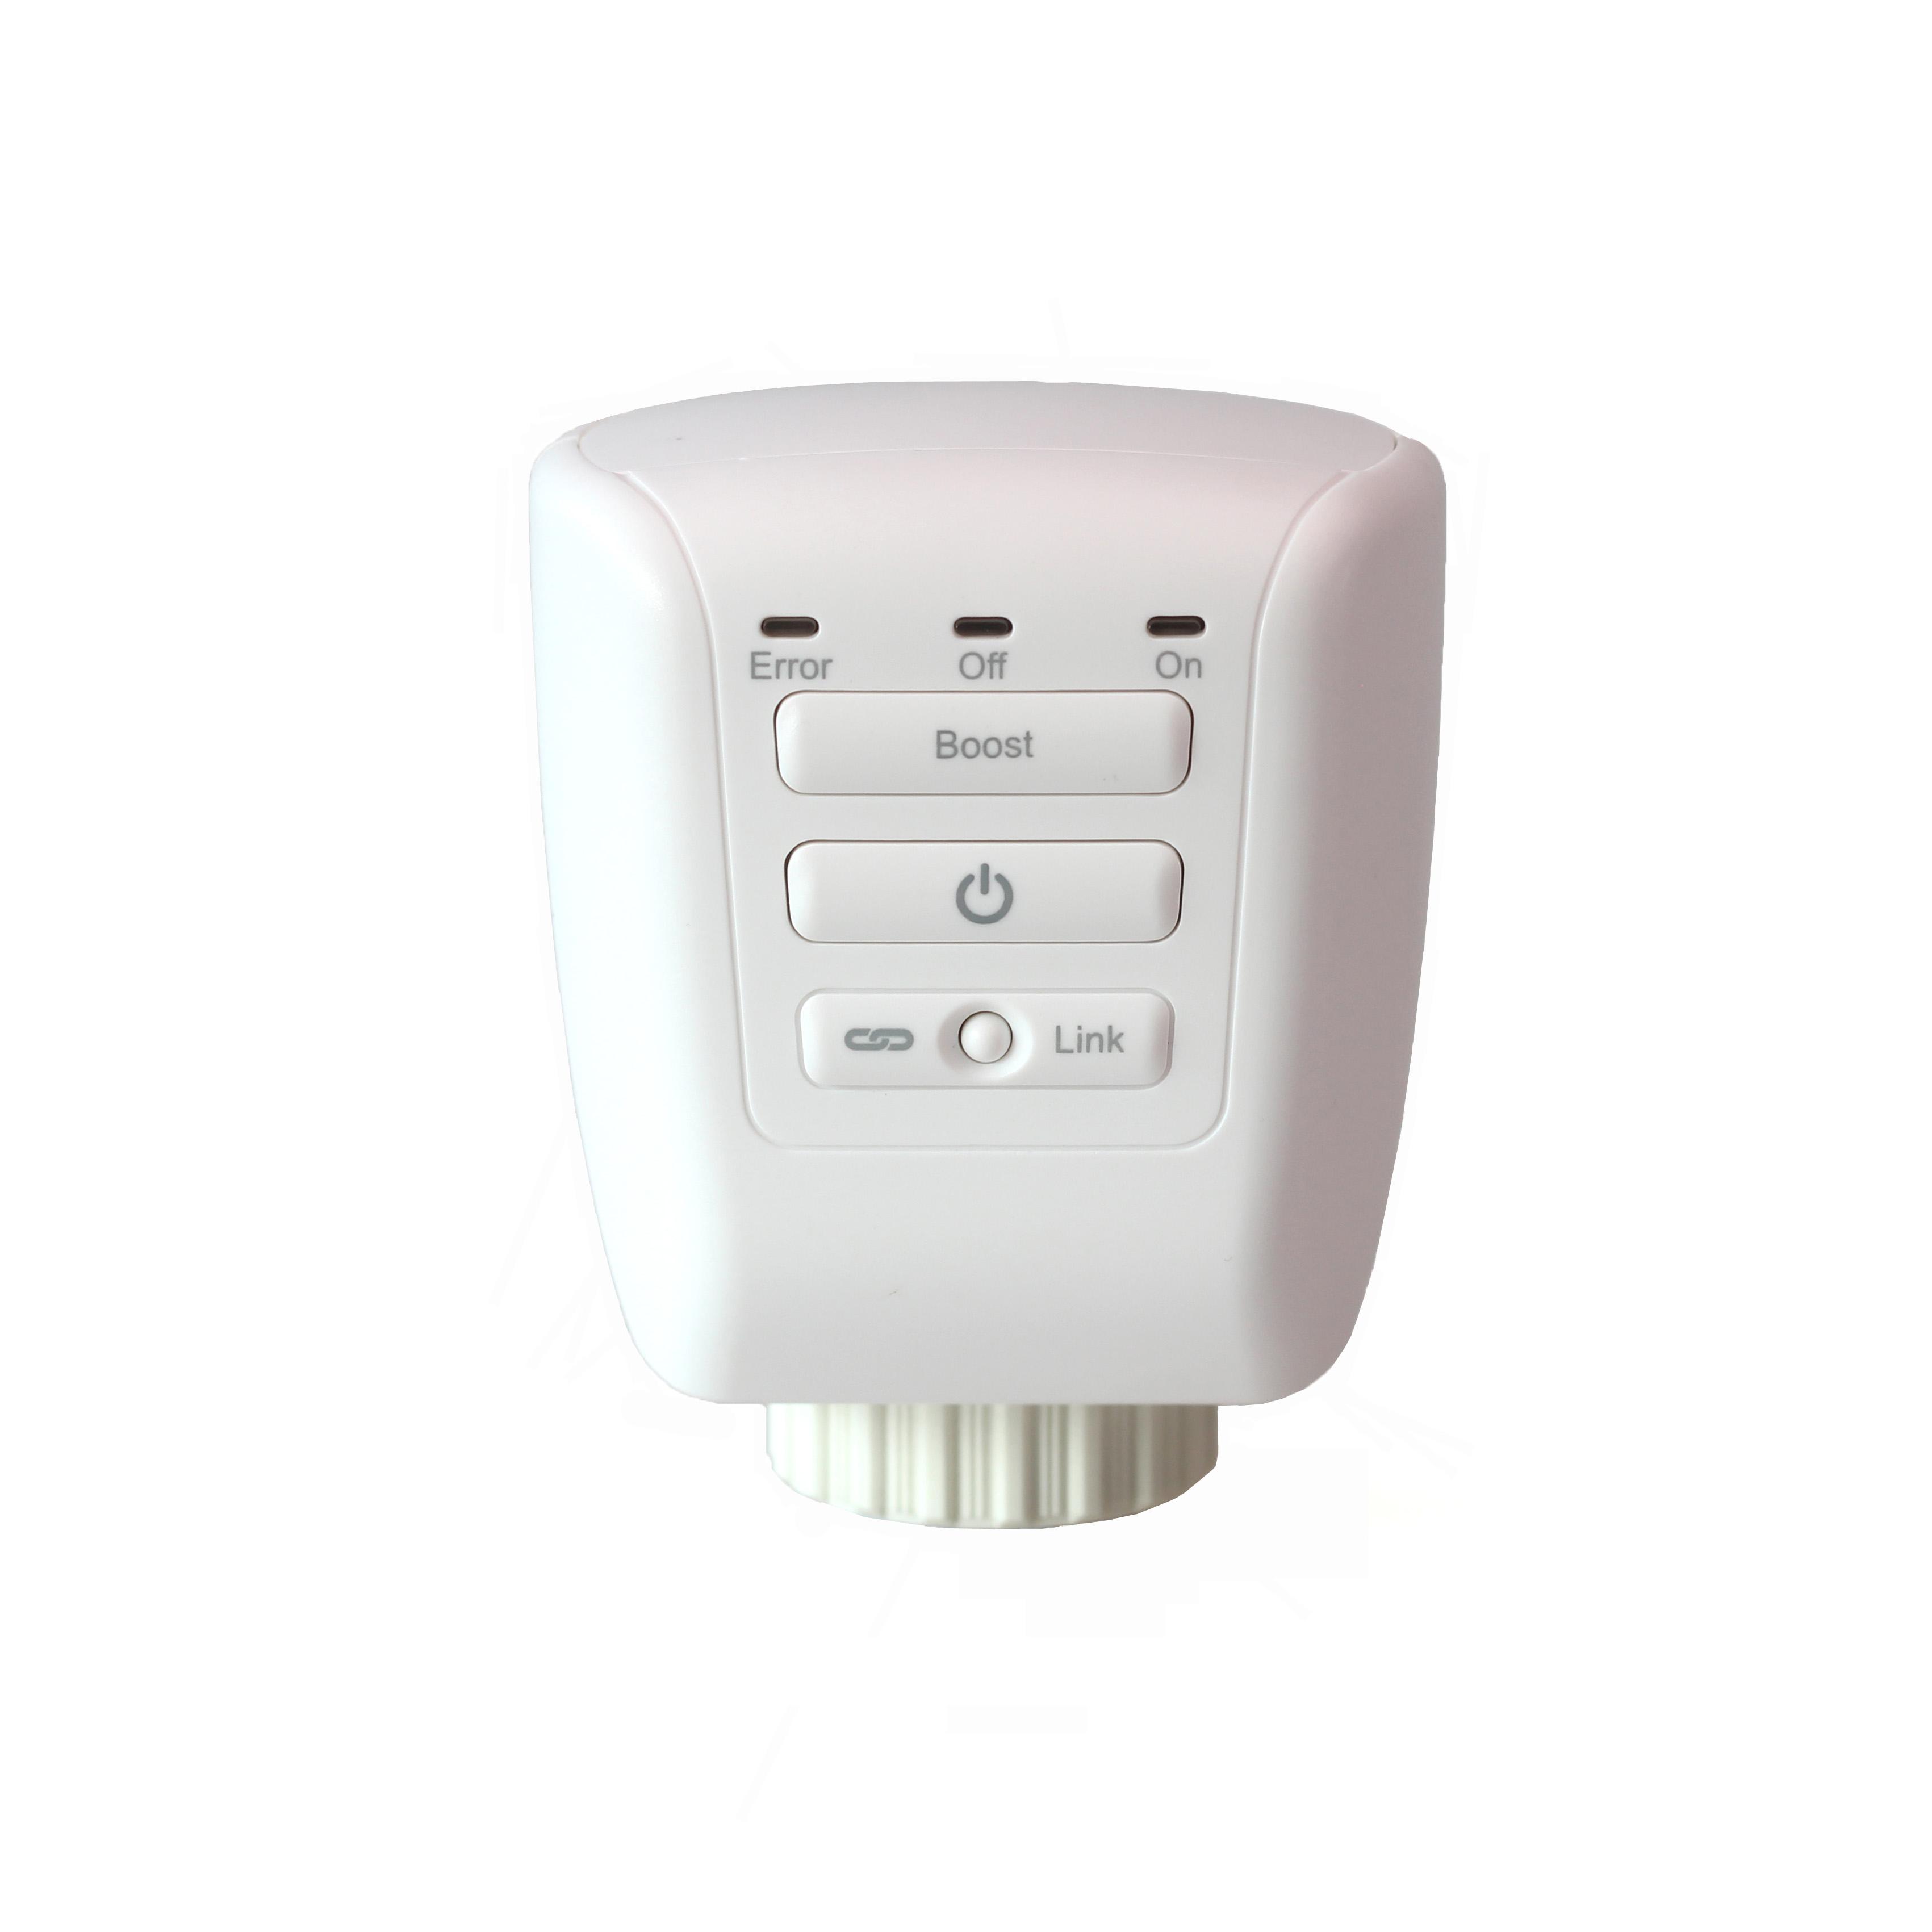 Lightwave LW922 Radiator Valve Whi